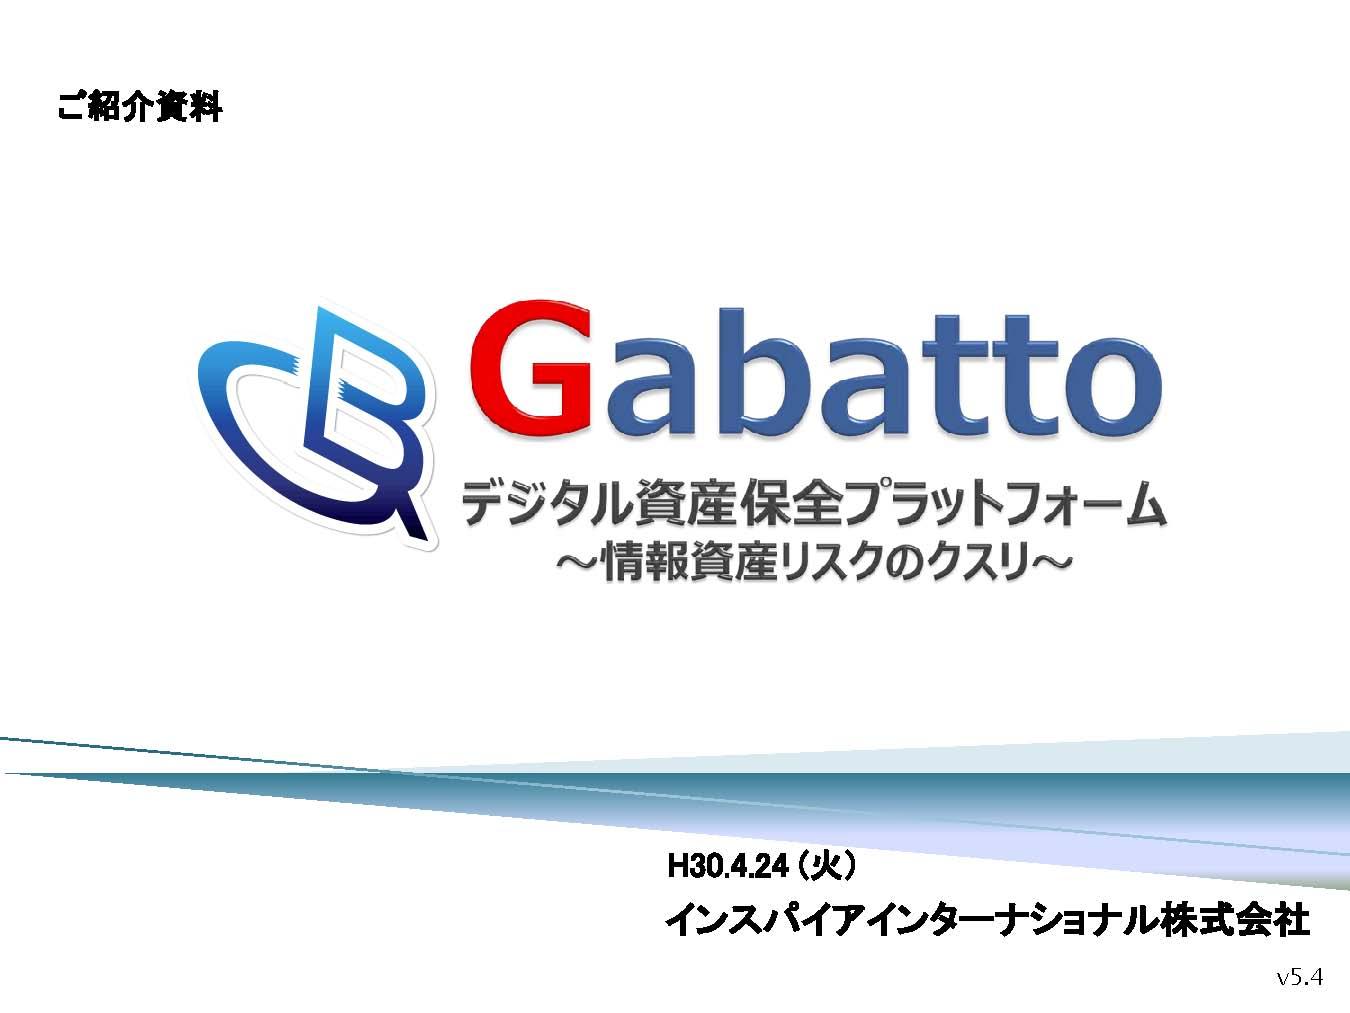 gabatto_intro_ページ_01